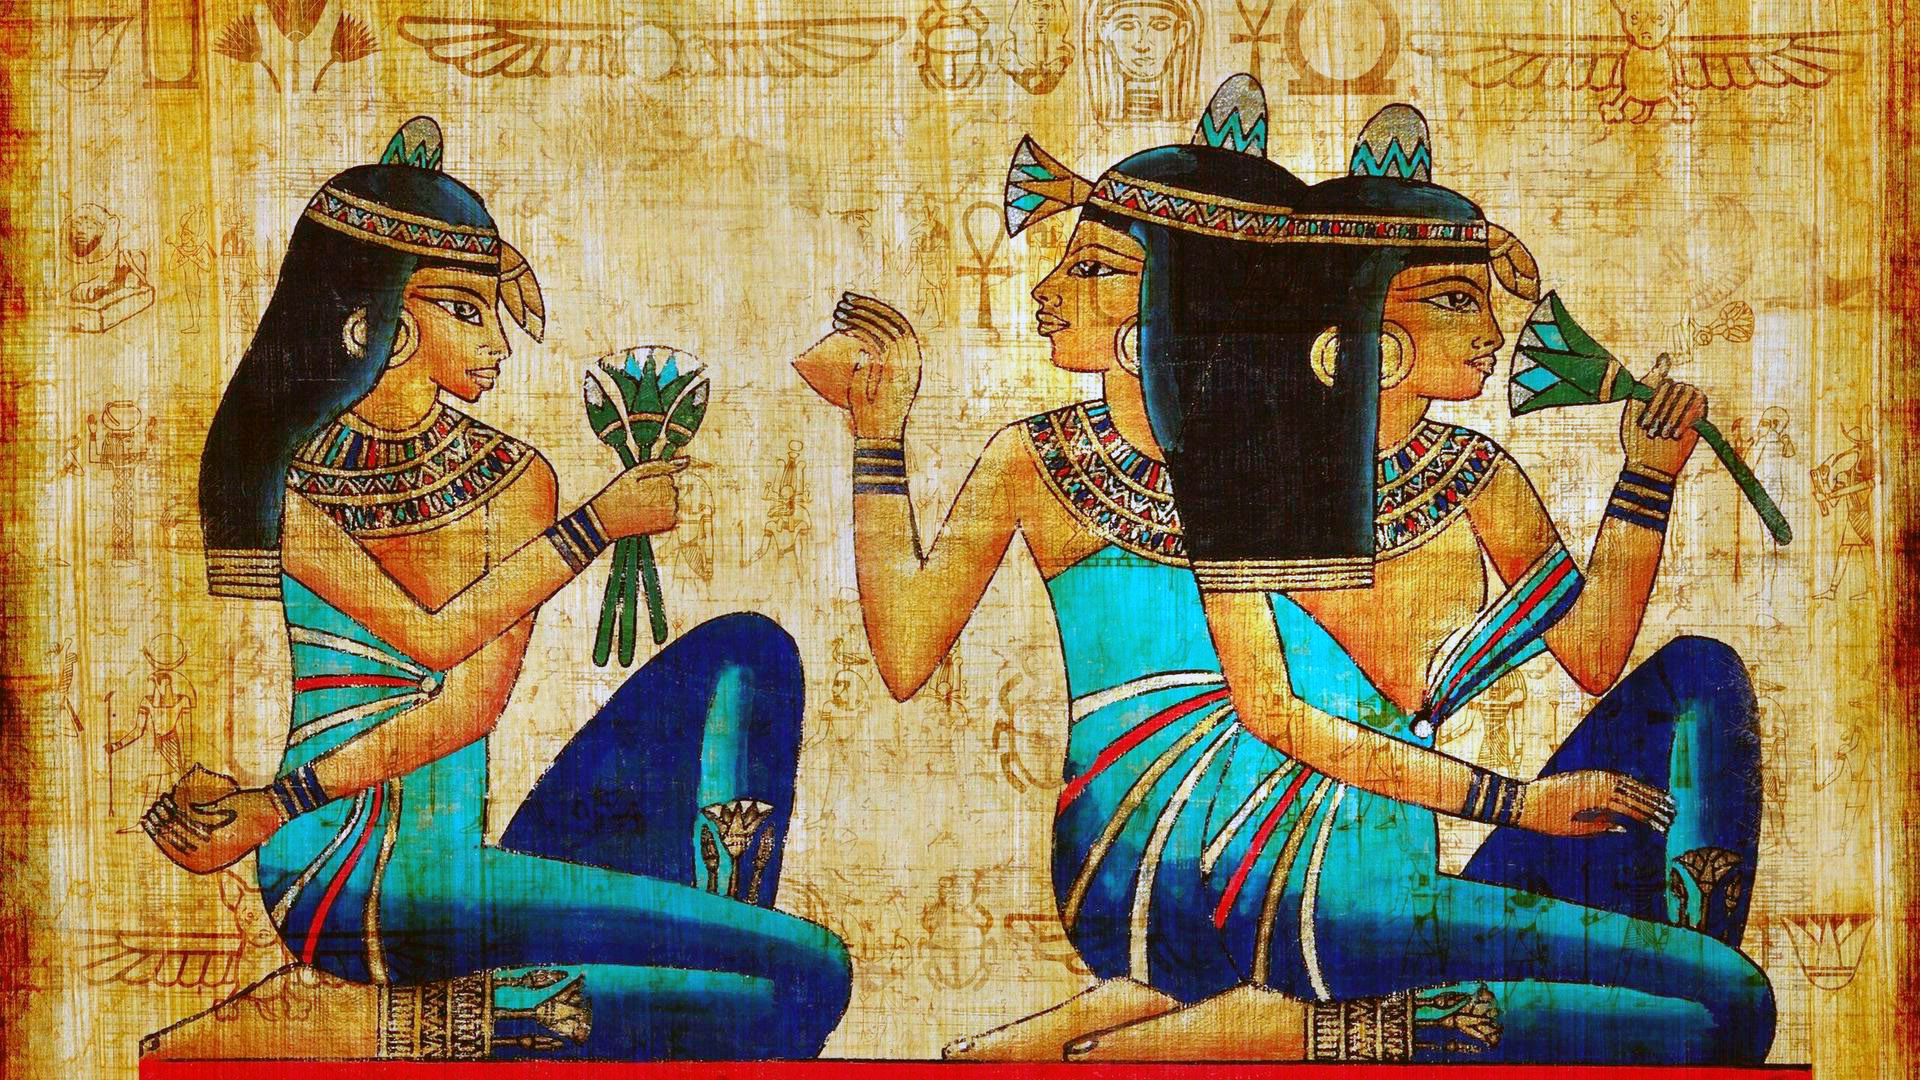 HDoboi.Kiev.ua - Египетский рисунок на папирусе, обои на телефон андроид живопись, искусство, арт